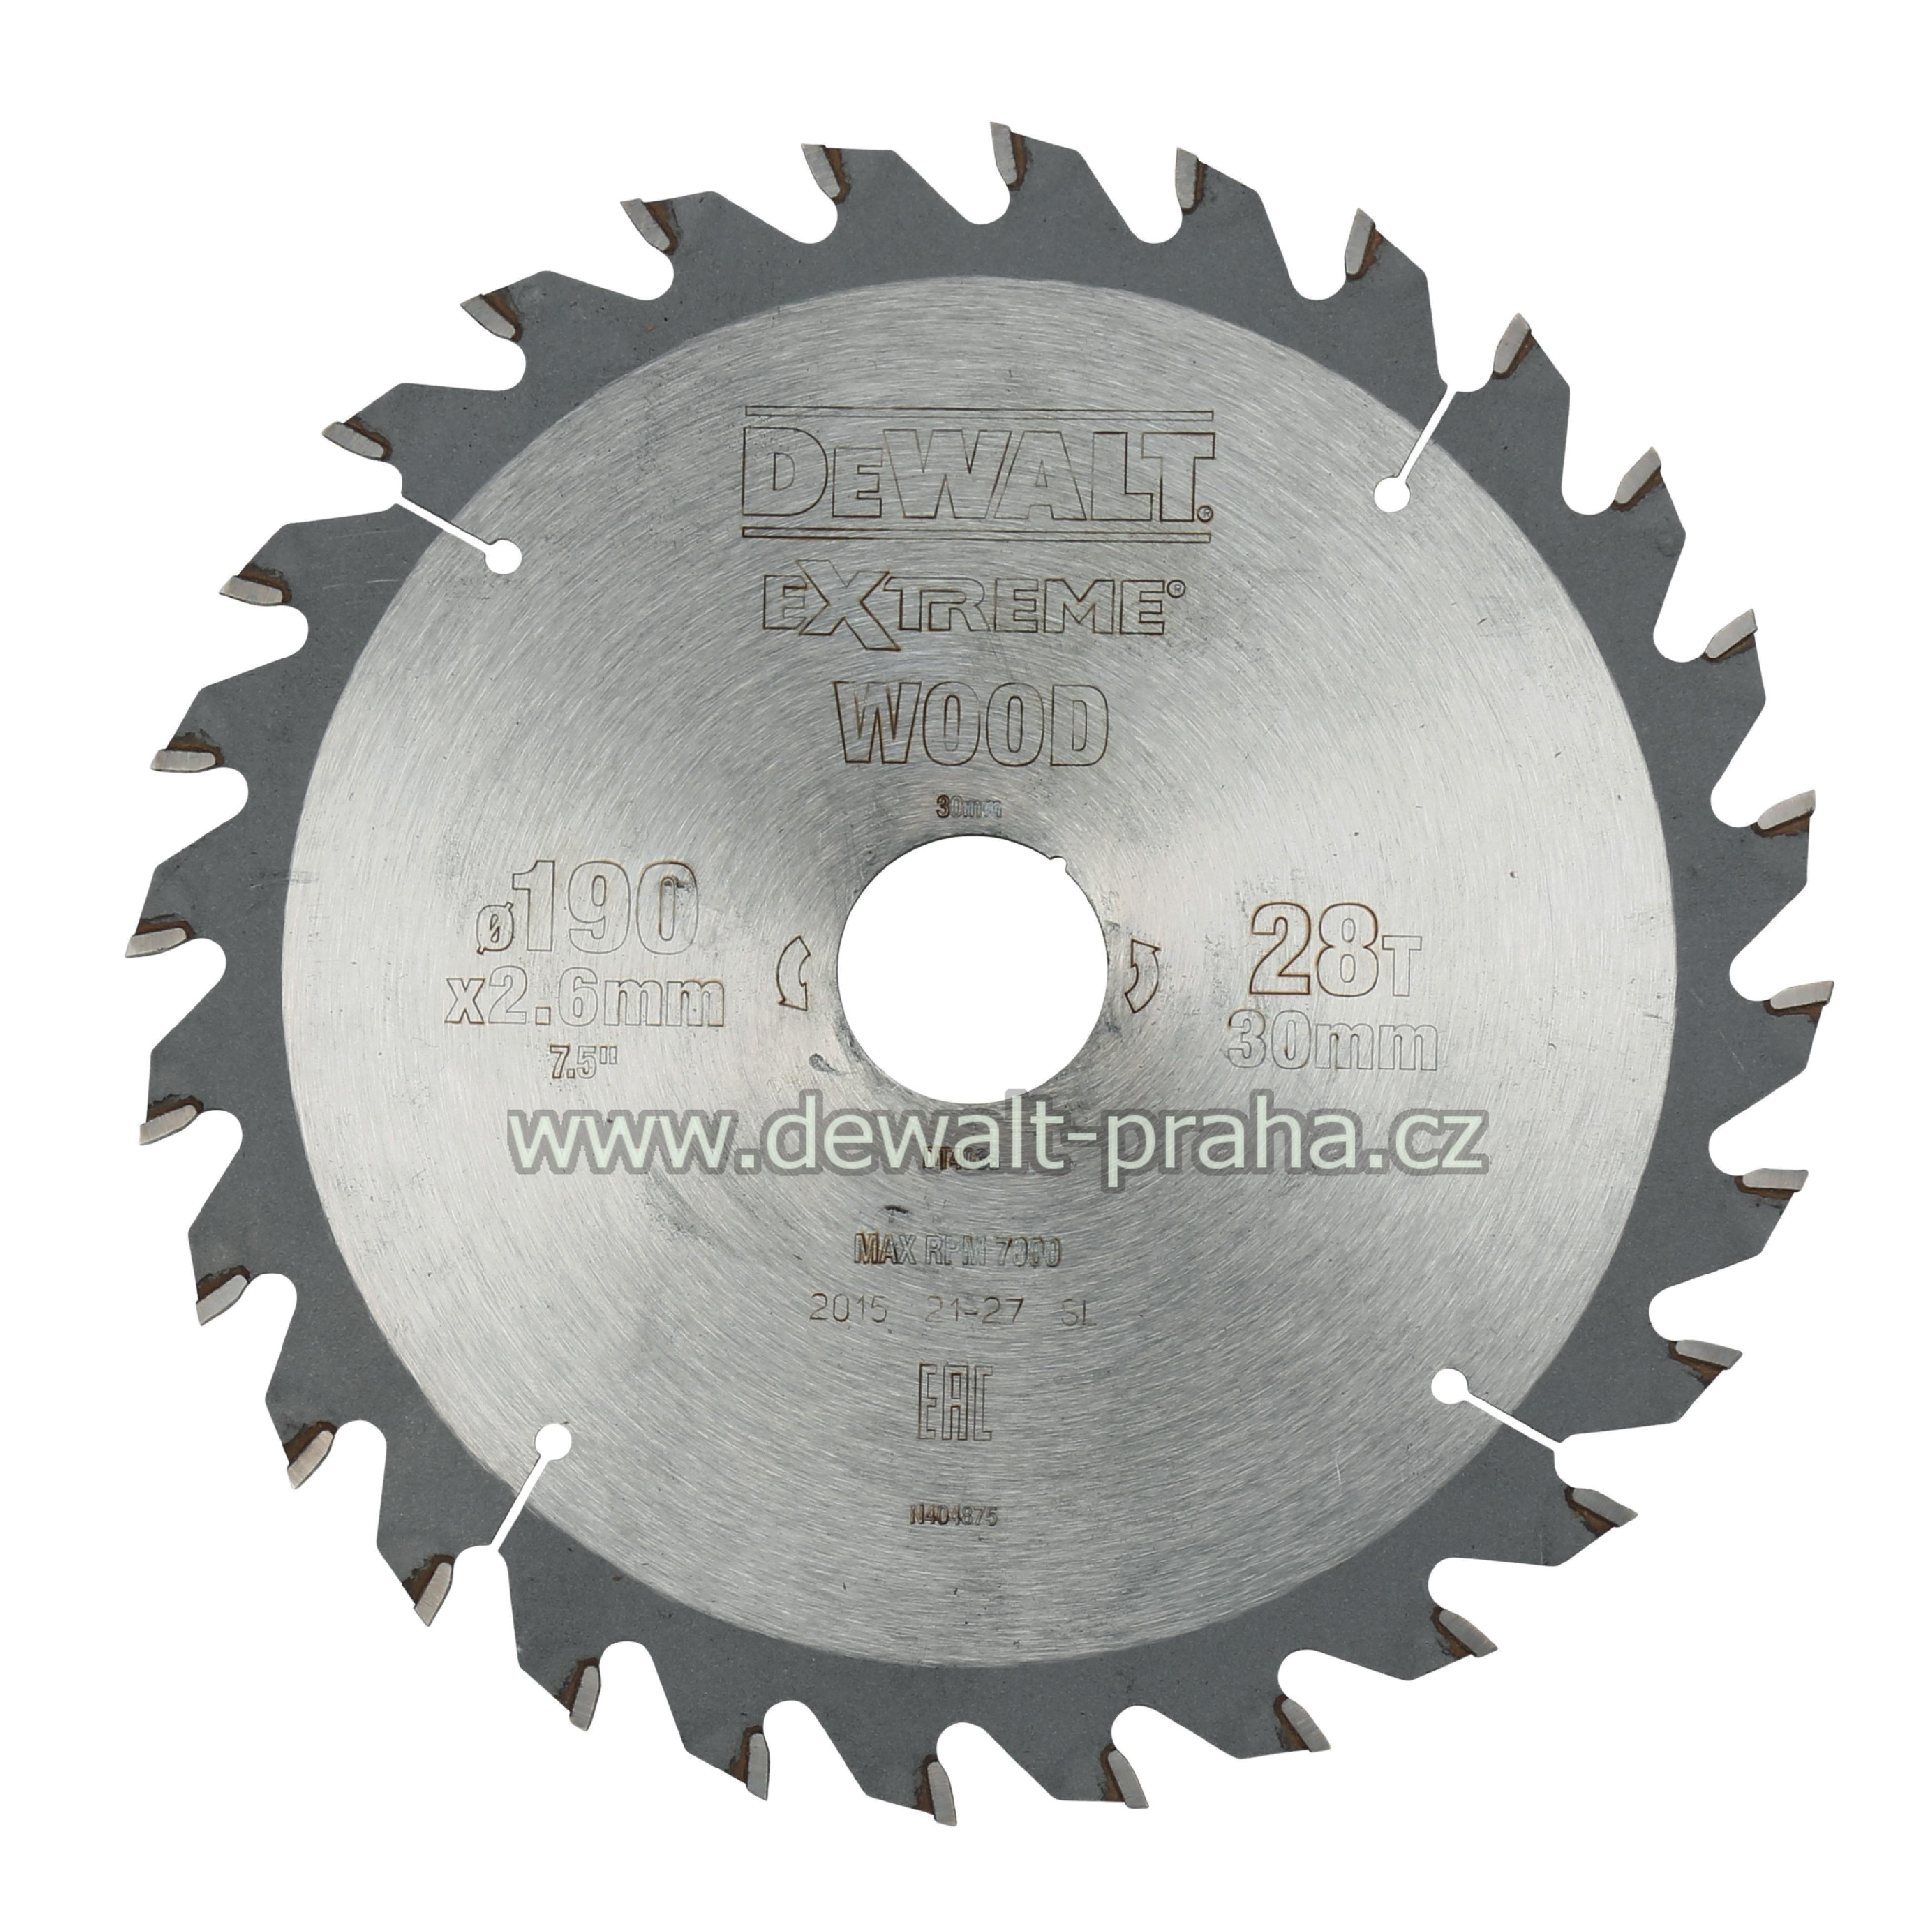 DT4033 DeWALT Pilový kotouč 190 x 30 mm, 28 zubů